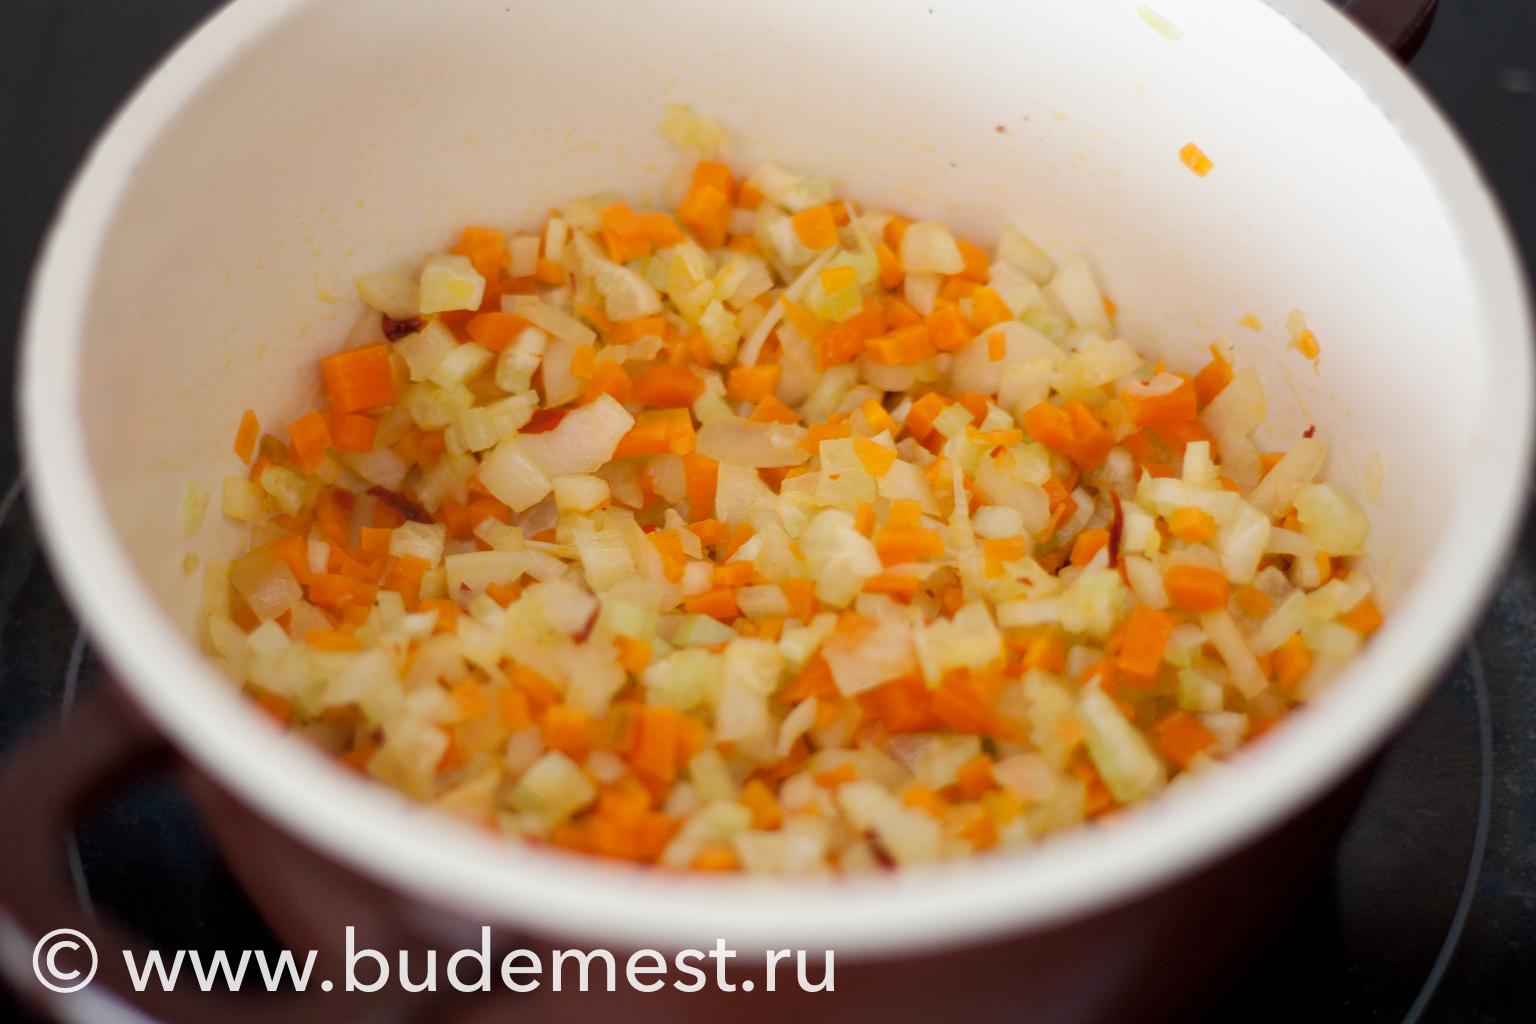 Поджарьте овощи для рагу на 1 ст.л оливкового масла